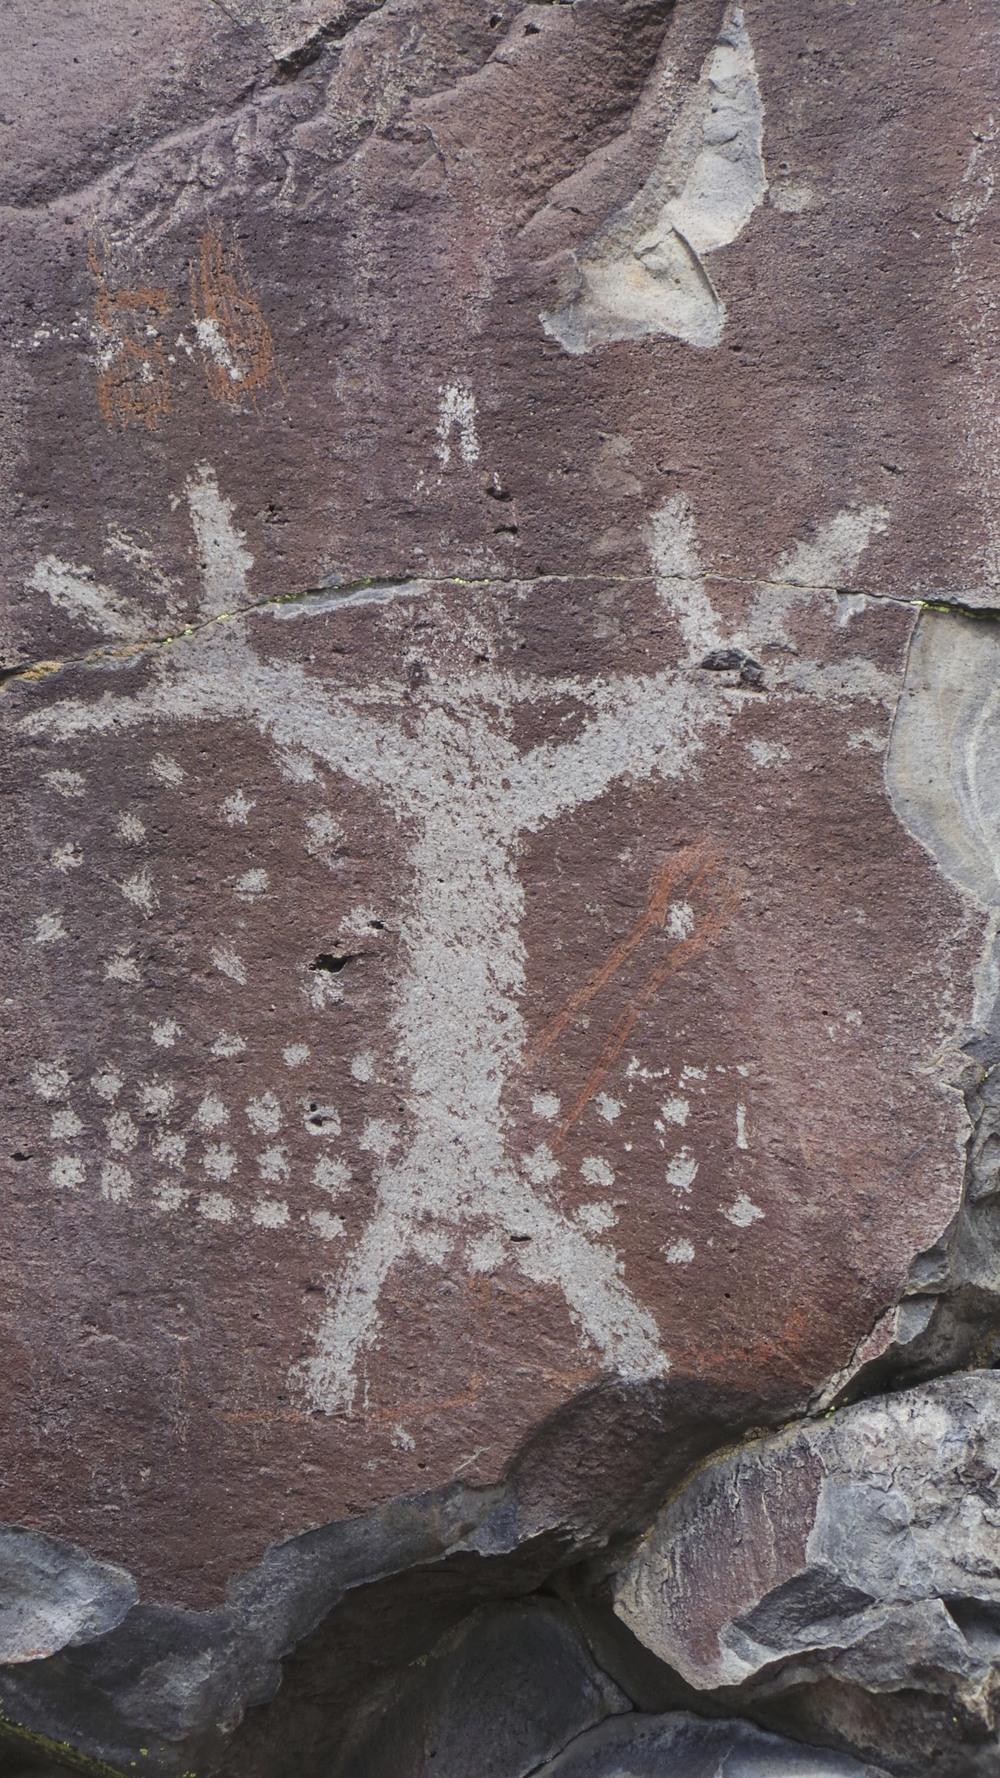 Lagomarsino Petroglyph Site 267.jpg